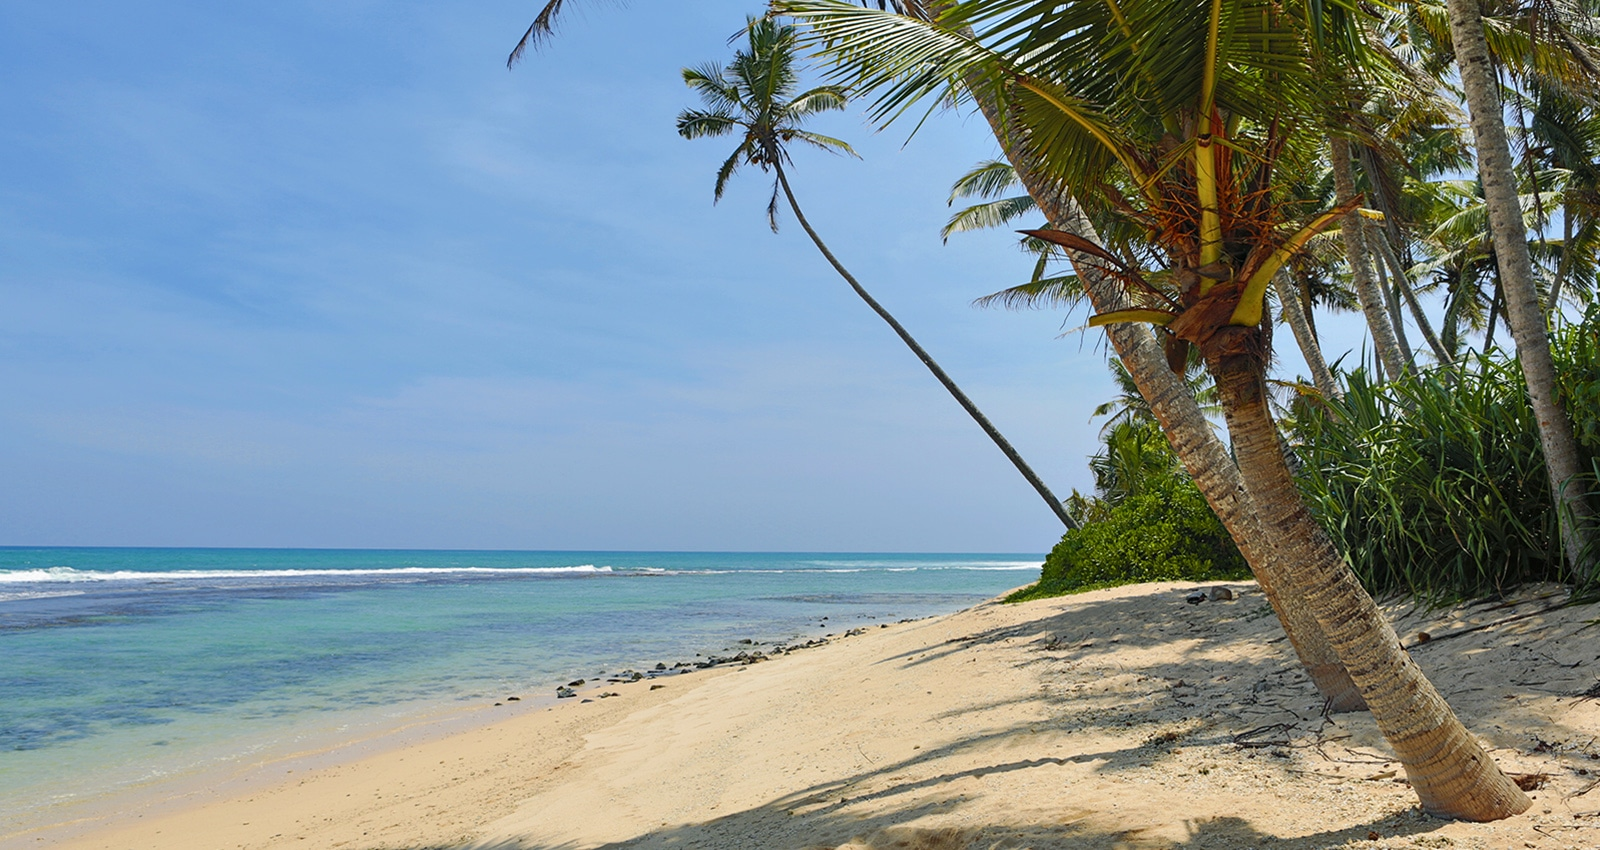 Turtle Eco Beach view